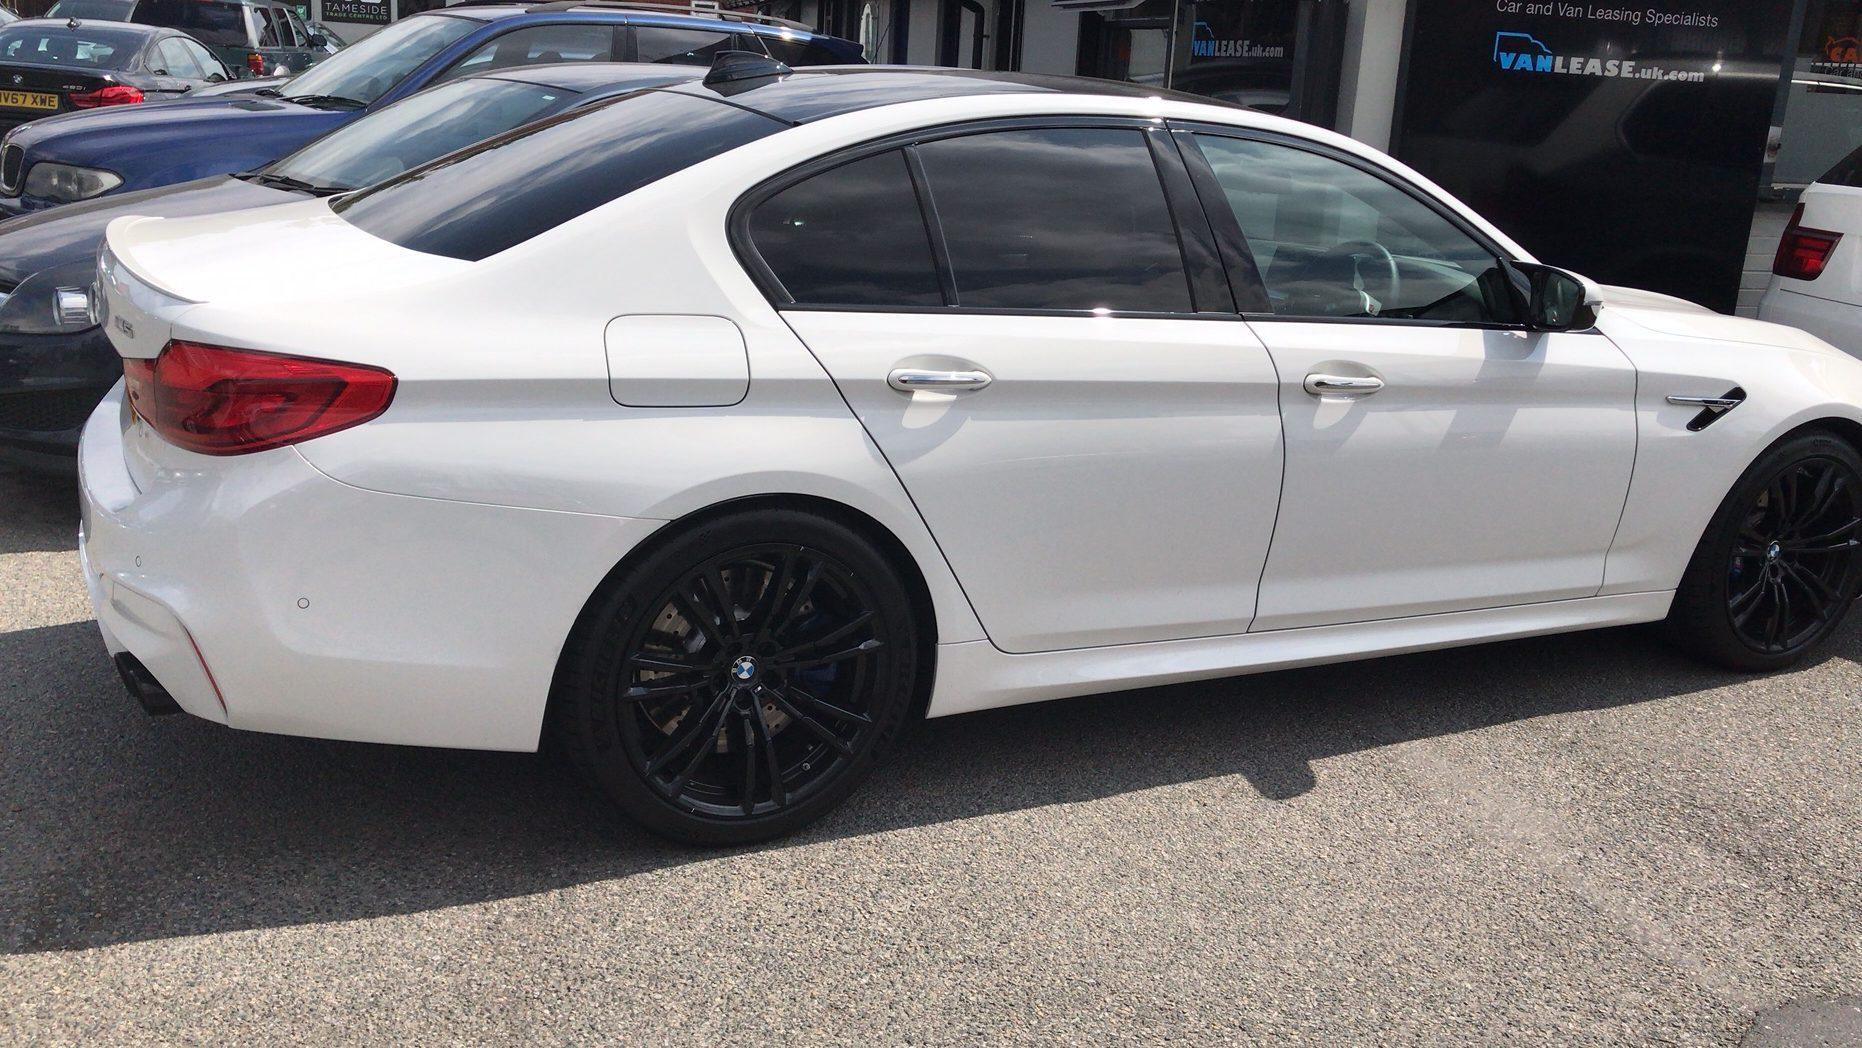 BMW M5 SALOON M5 4dr DCT Car Leasing Performance